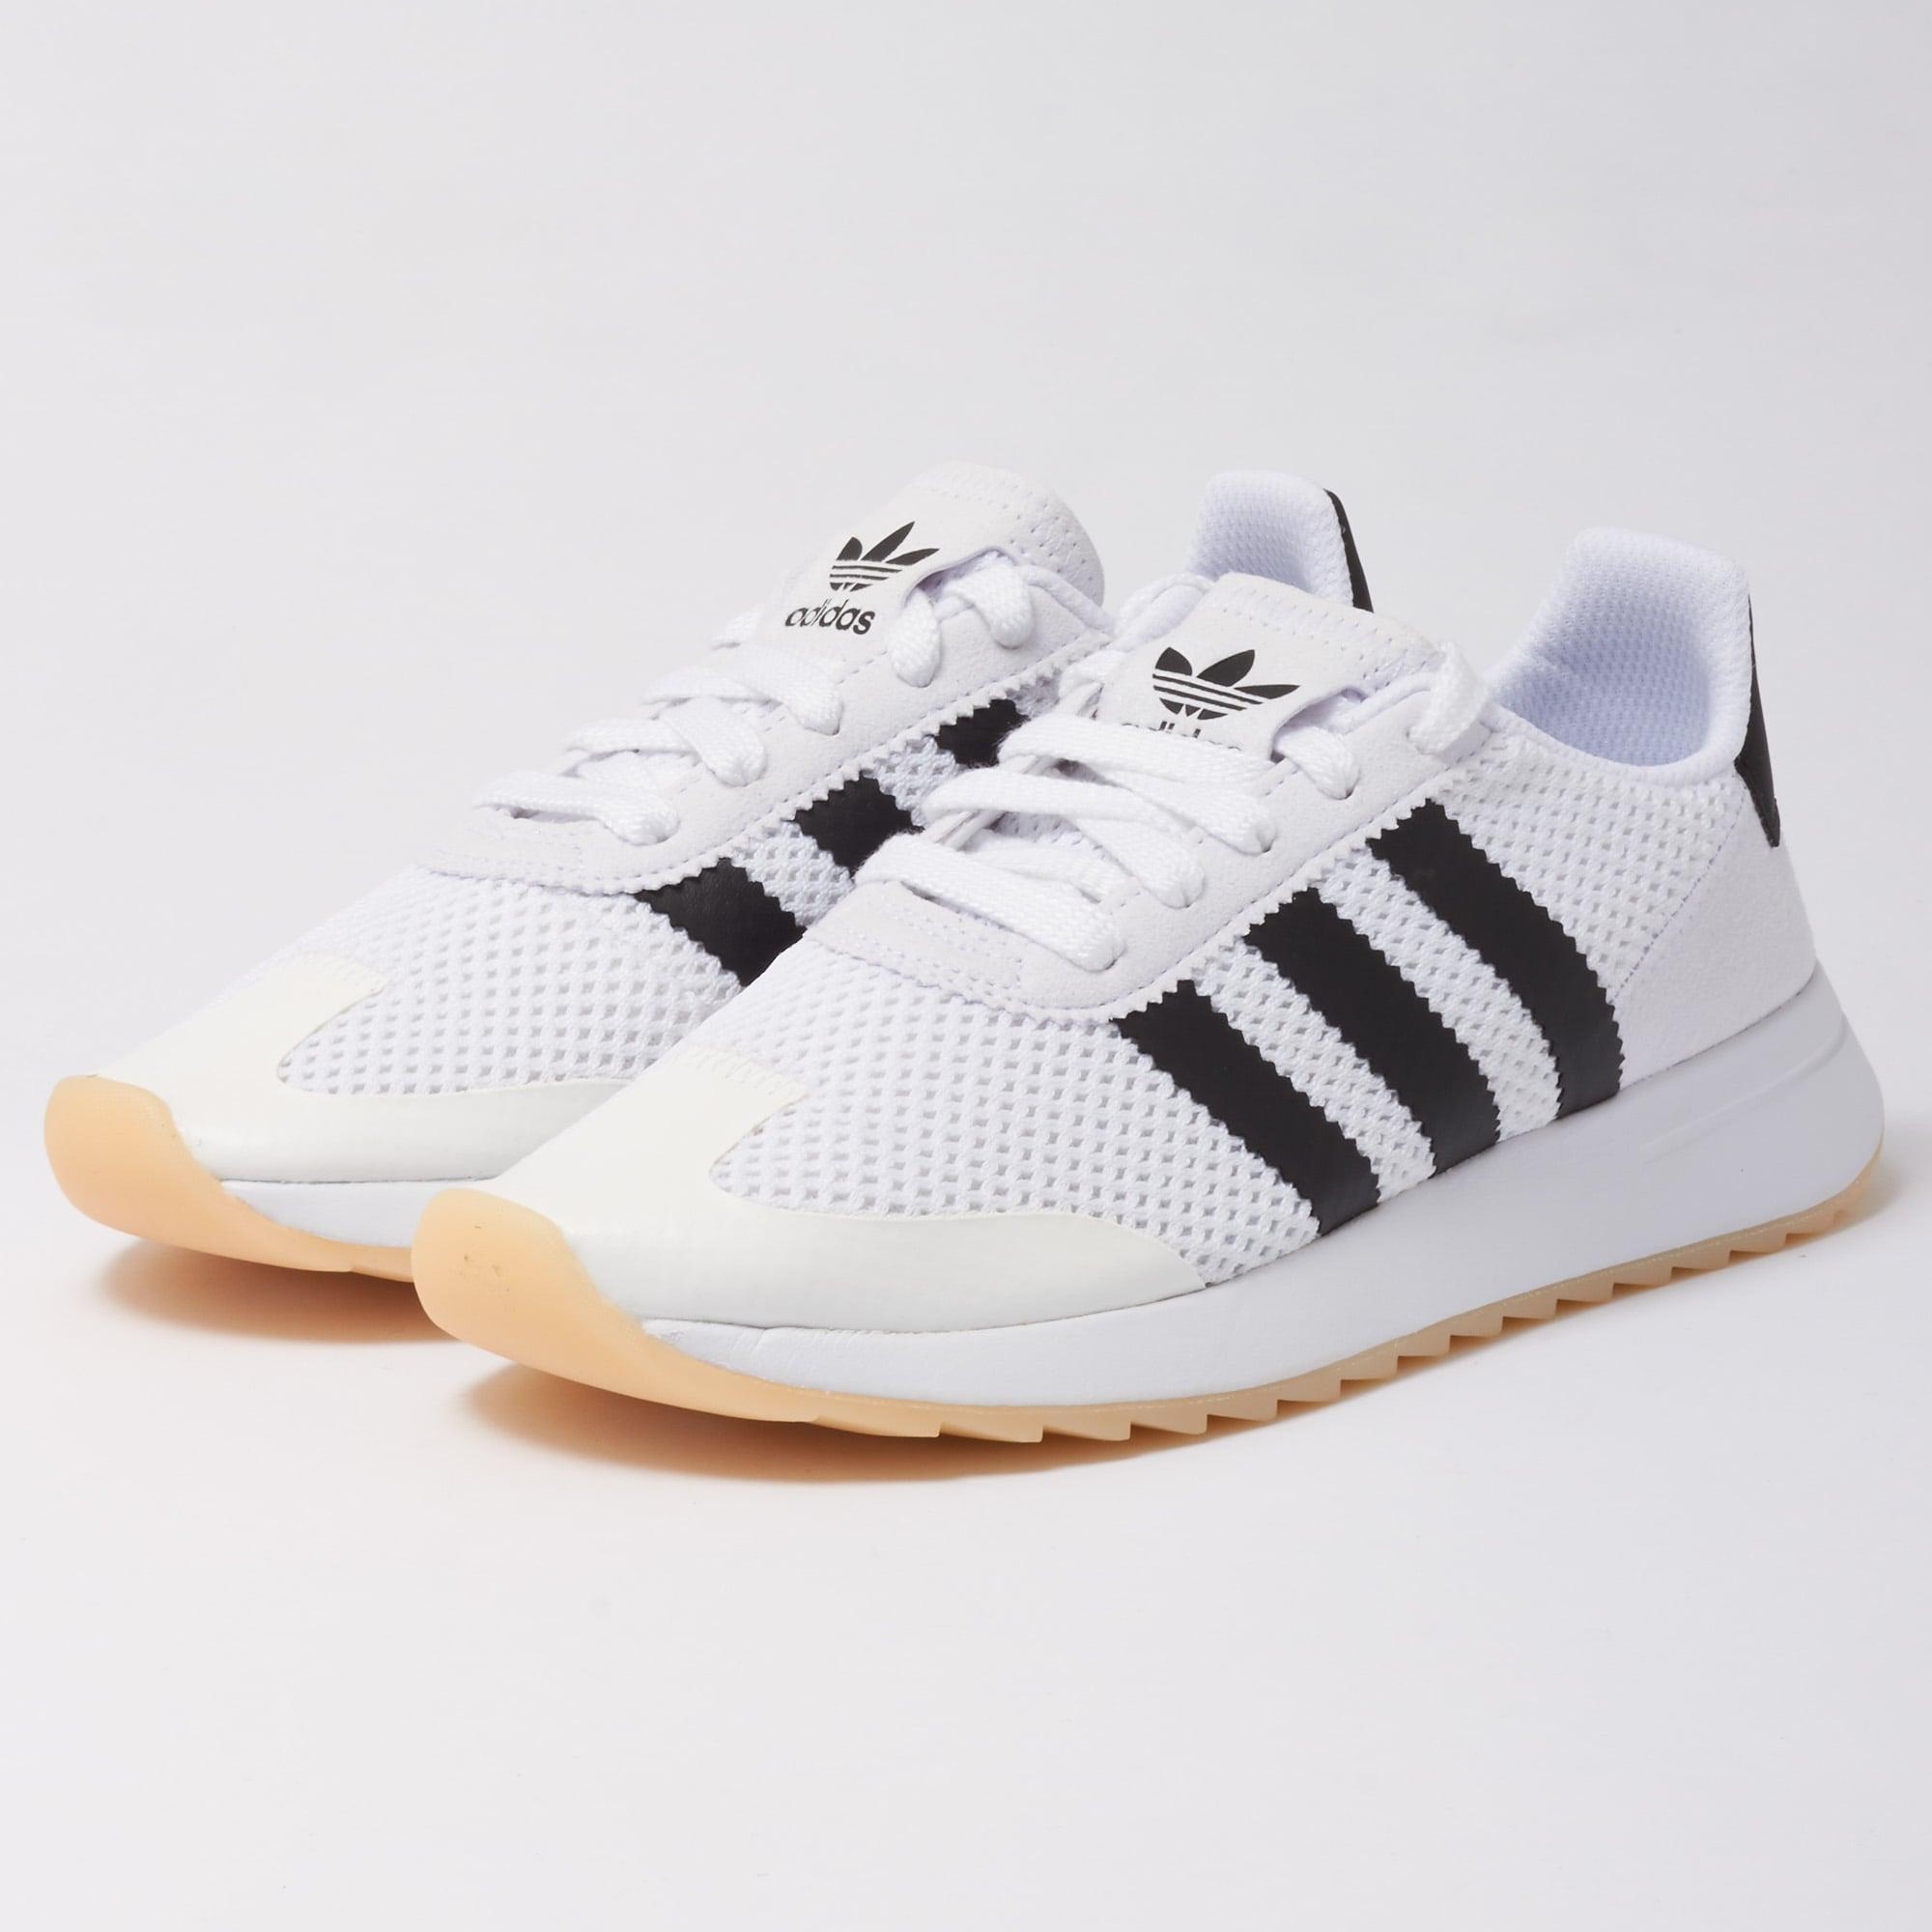 aeee0dd99ff Adidas Originals Womens FLB Sneakers (White) at Dandy Fellow